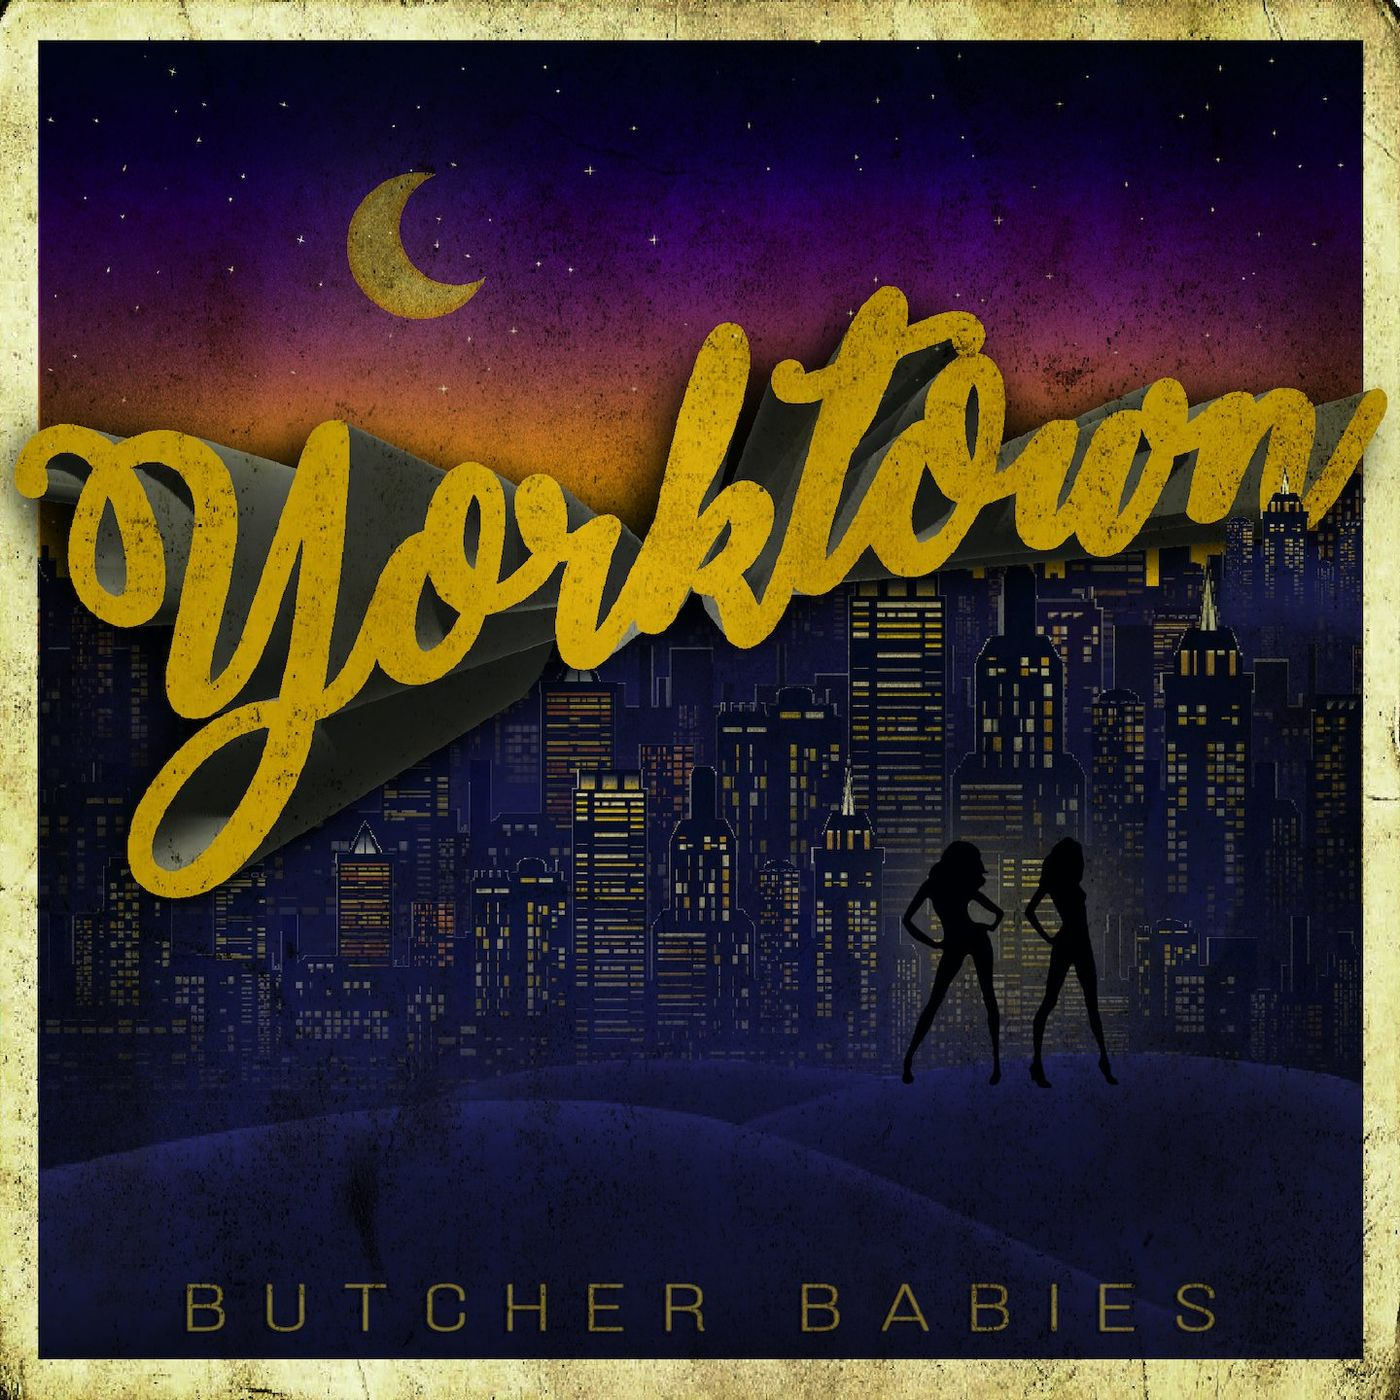 Butcher Babies - Yorktown [single] (2021)